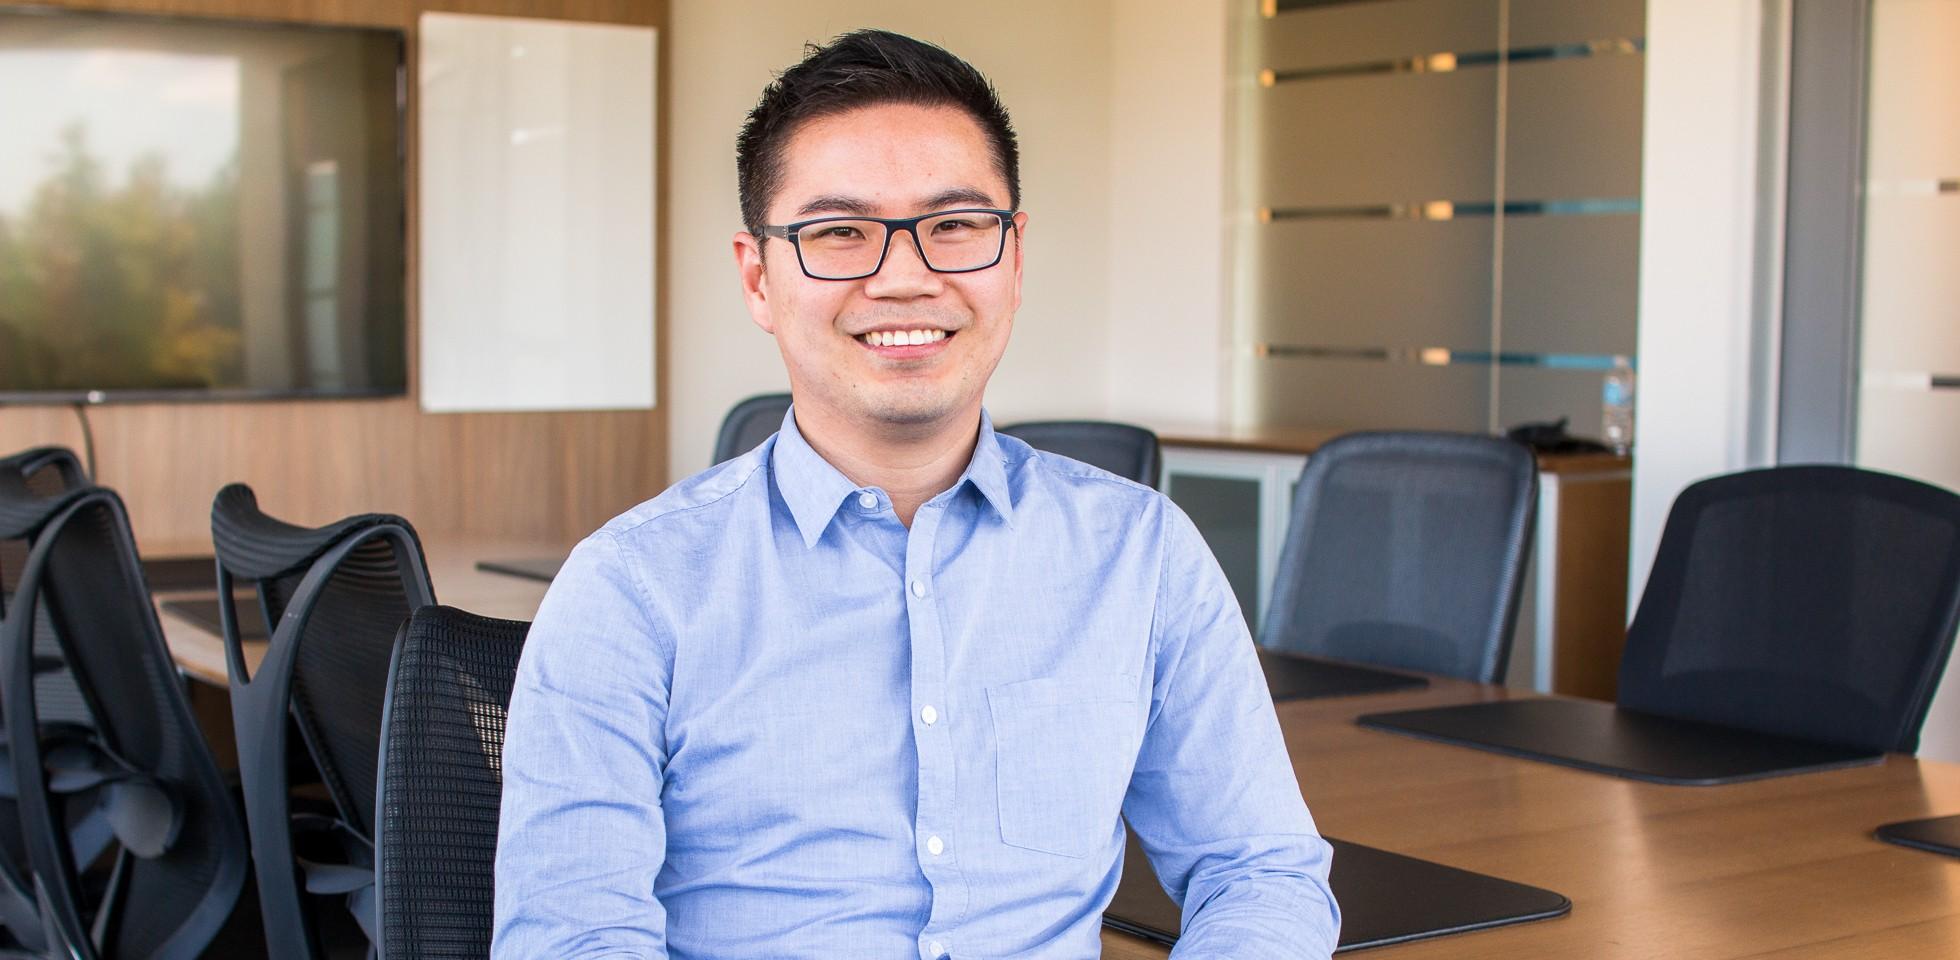 Linus Leung, Senior R&D Engineer - Baylis Medical Careers